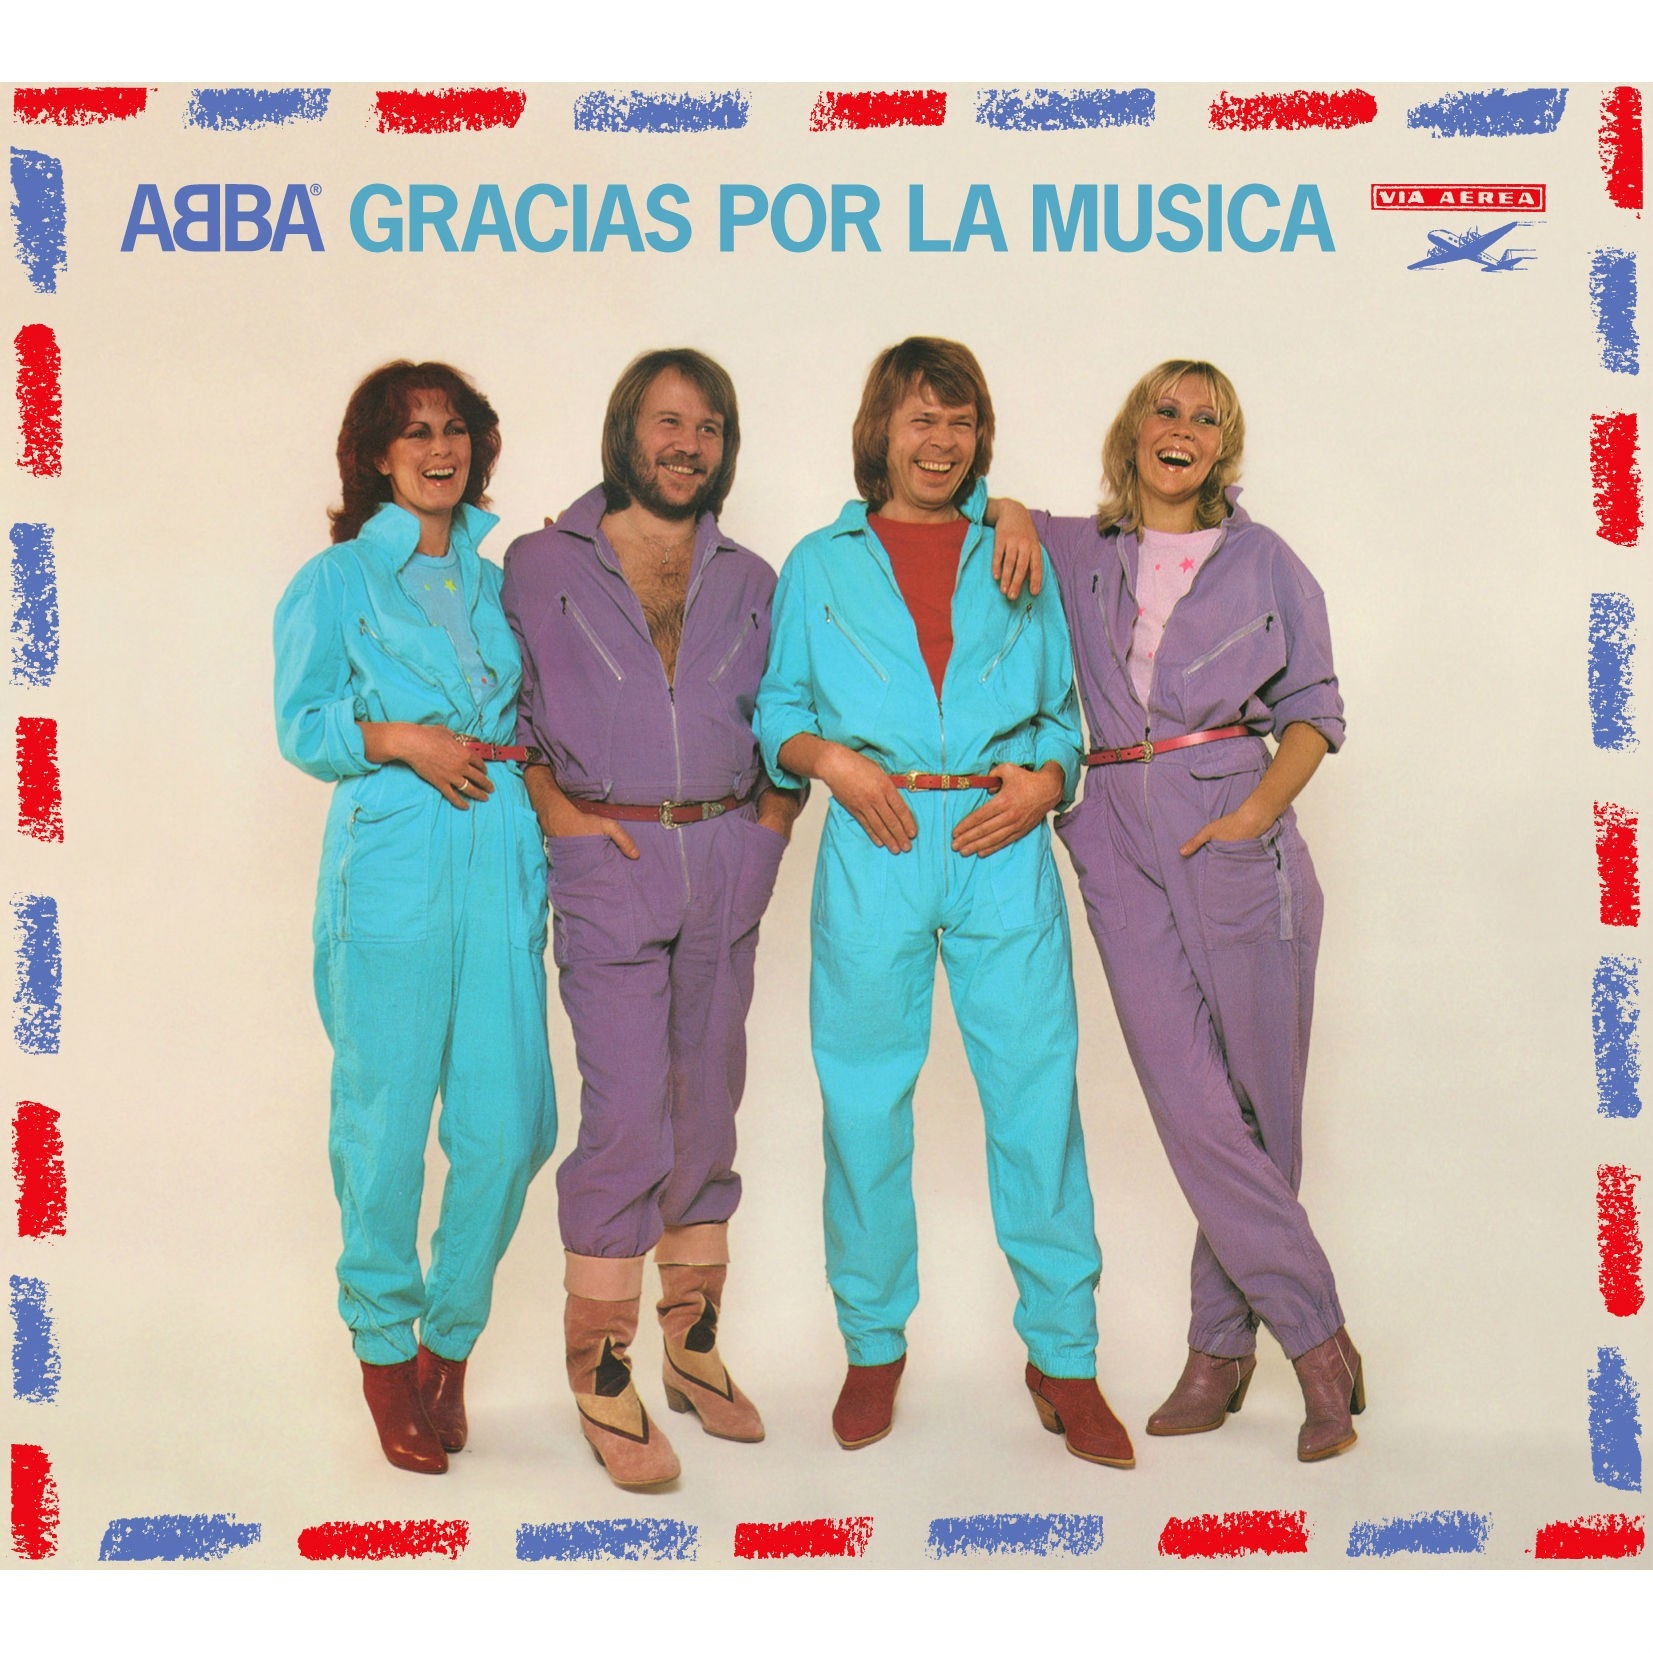 abba-gracias-por-la-musica-cddvd